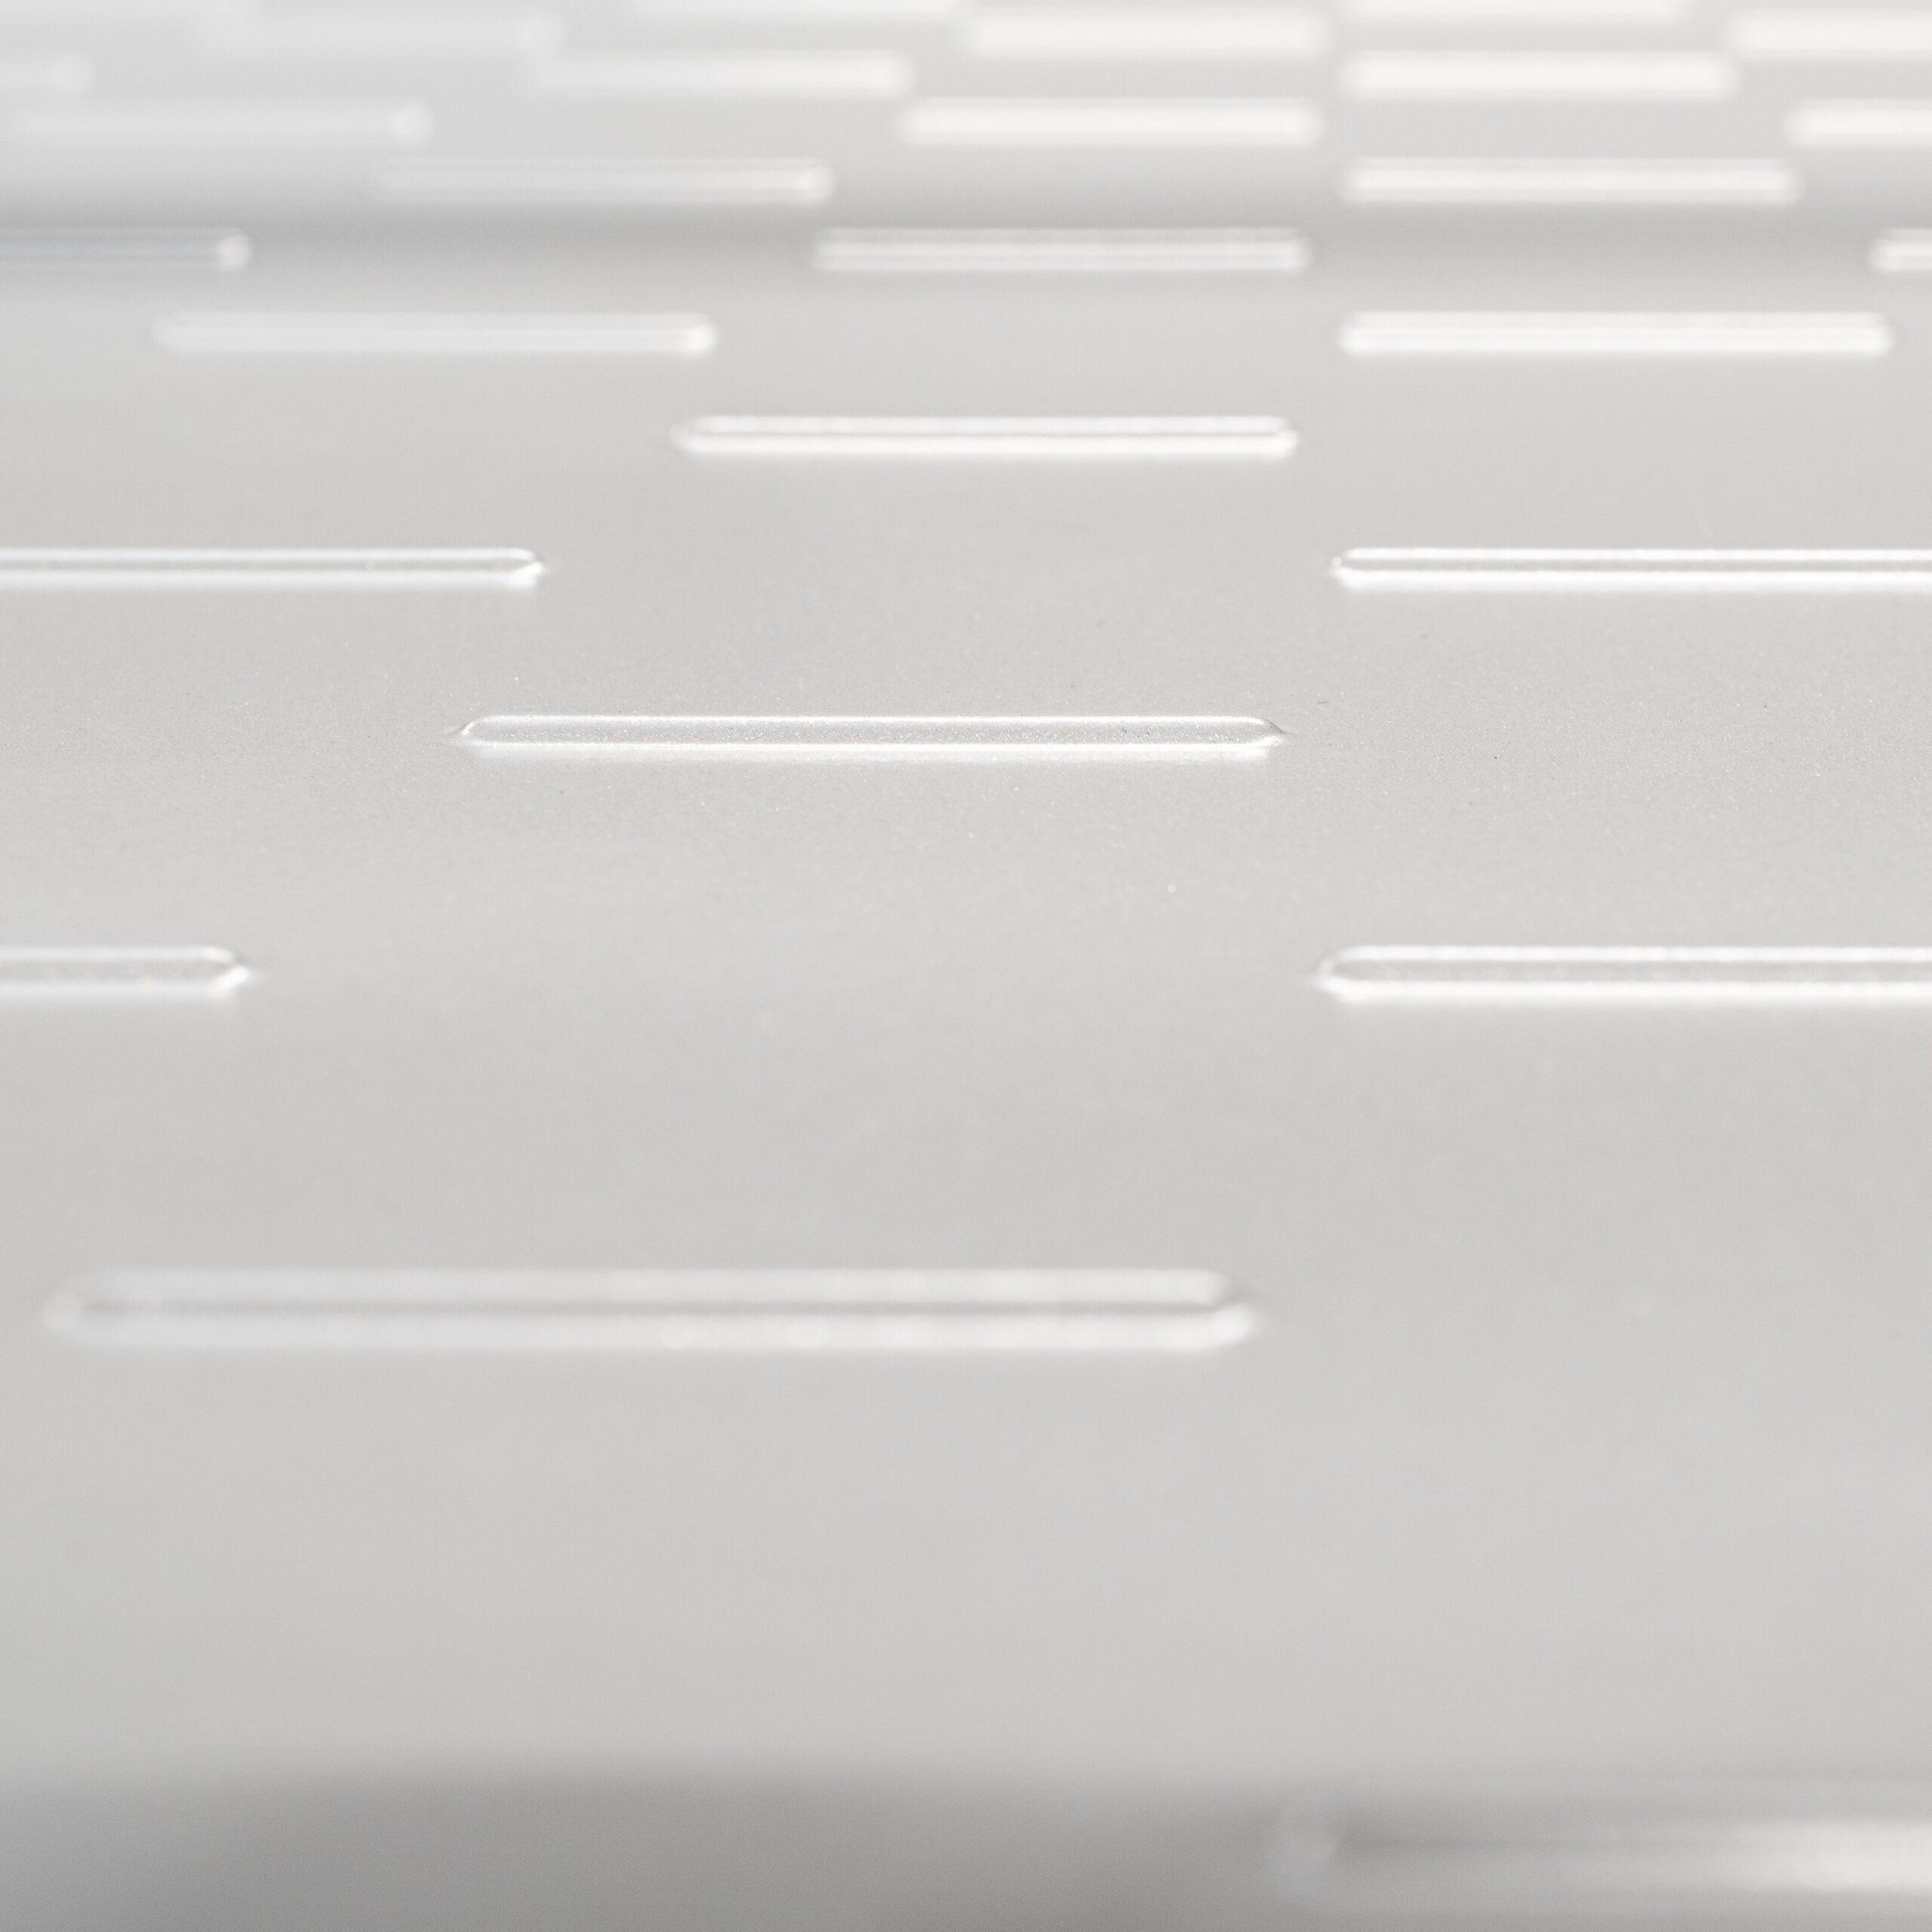 Plattformdetail Ascendor